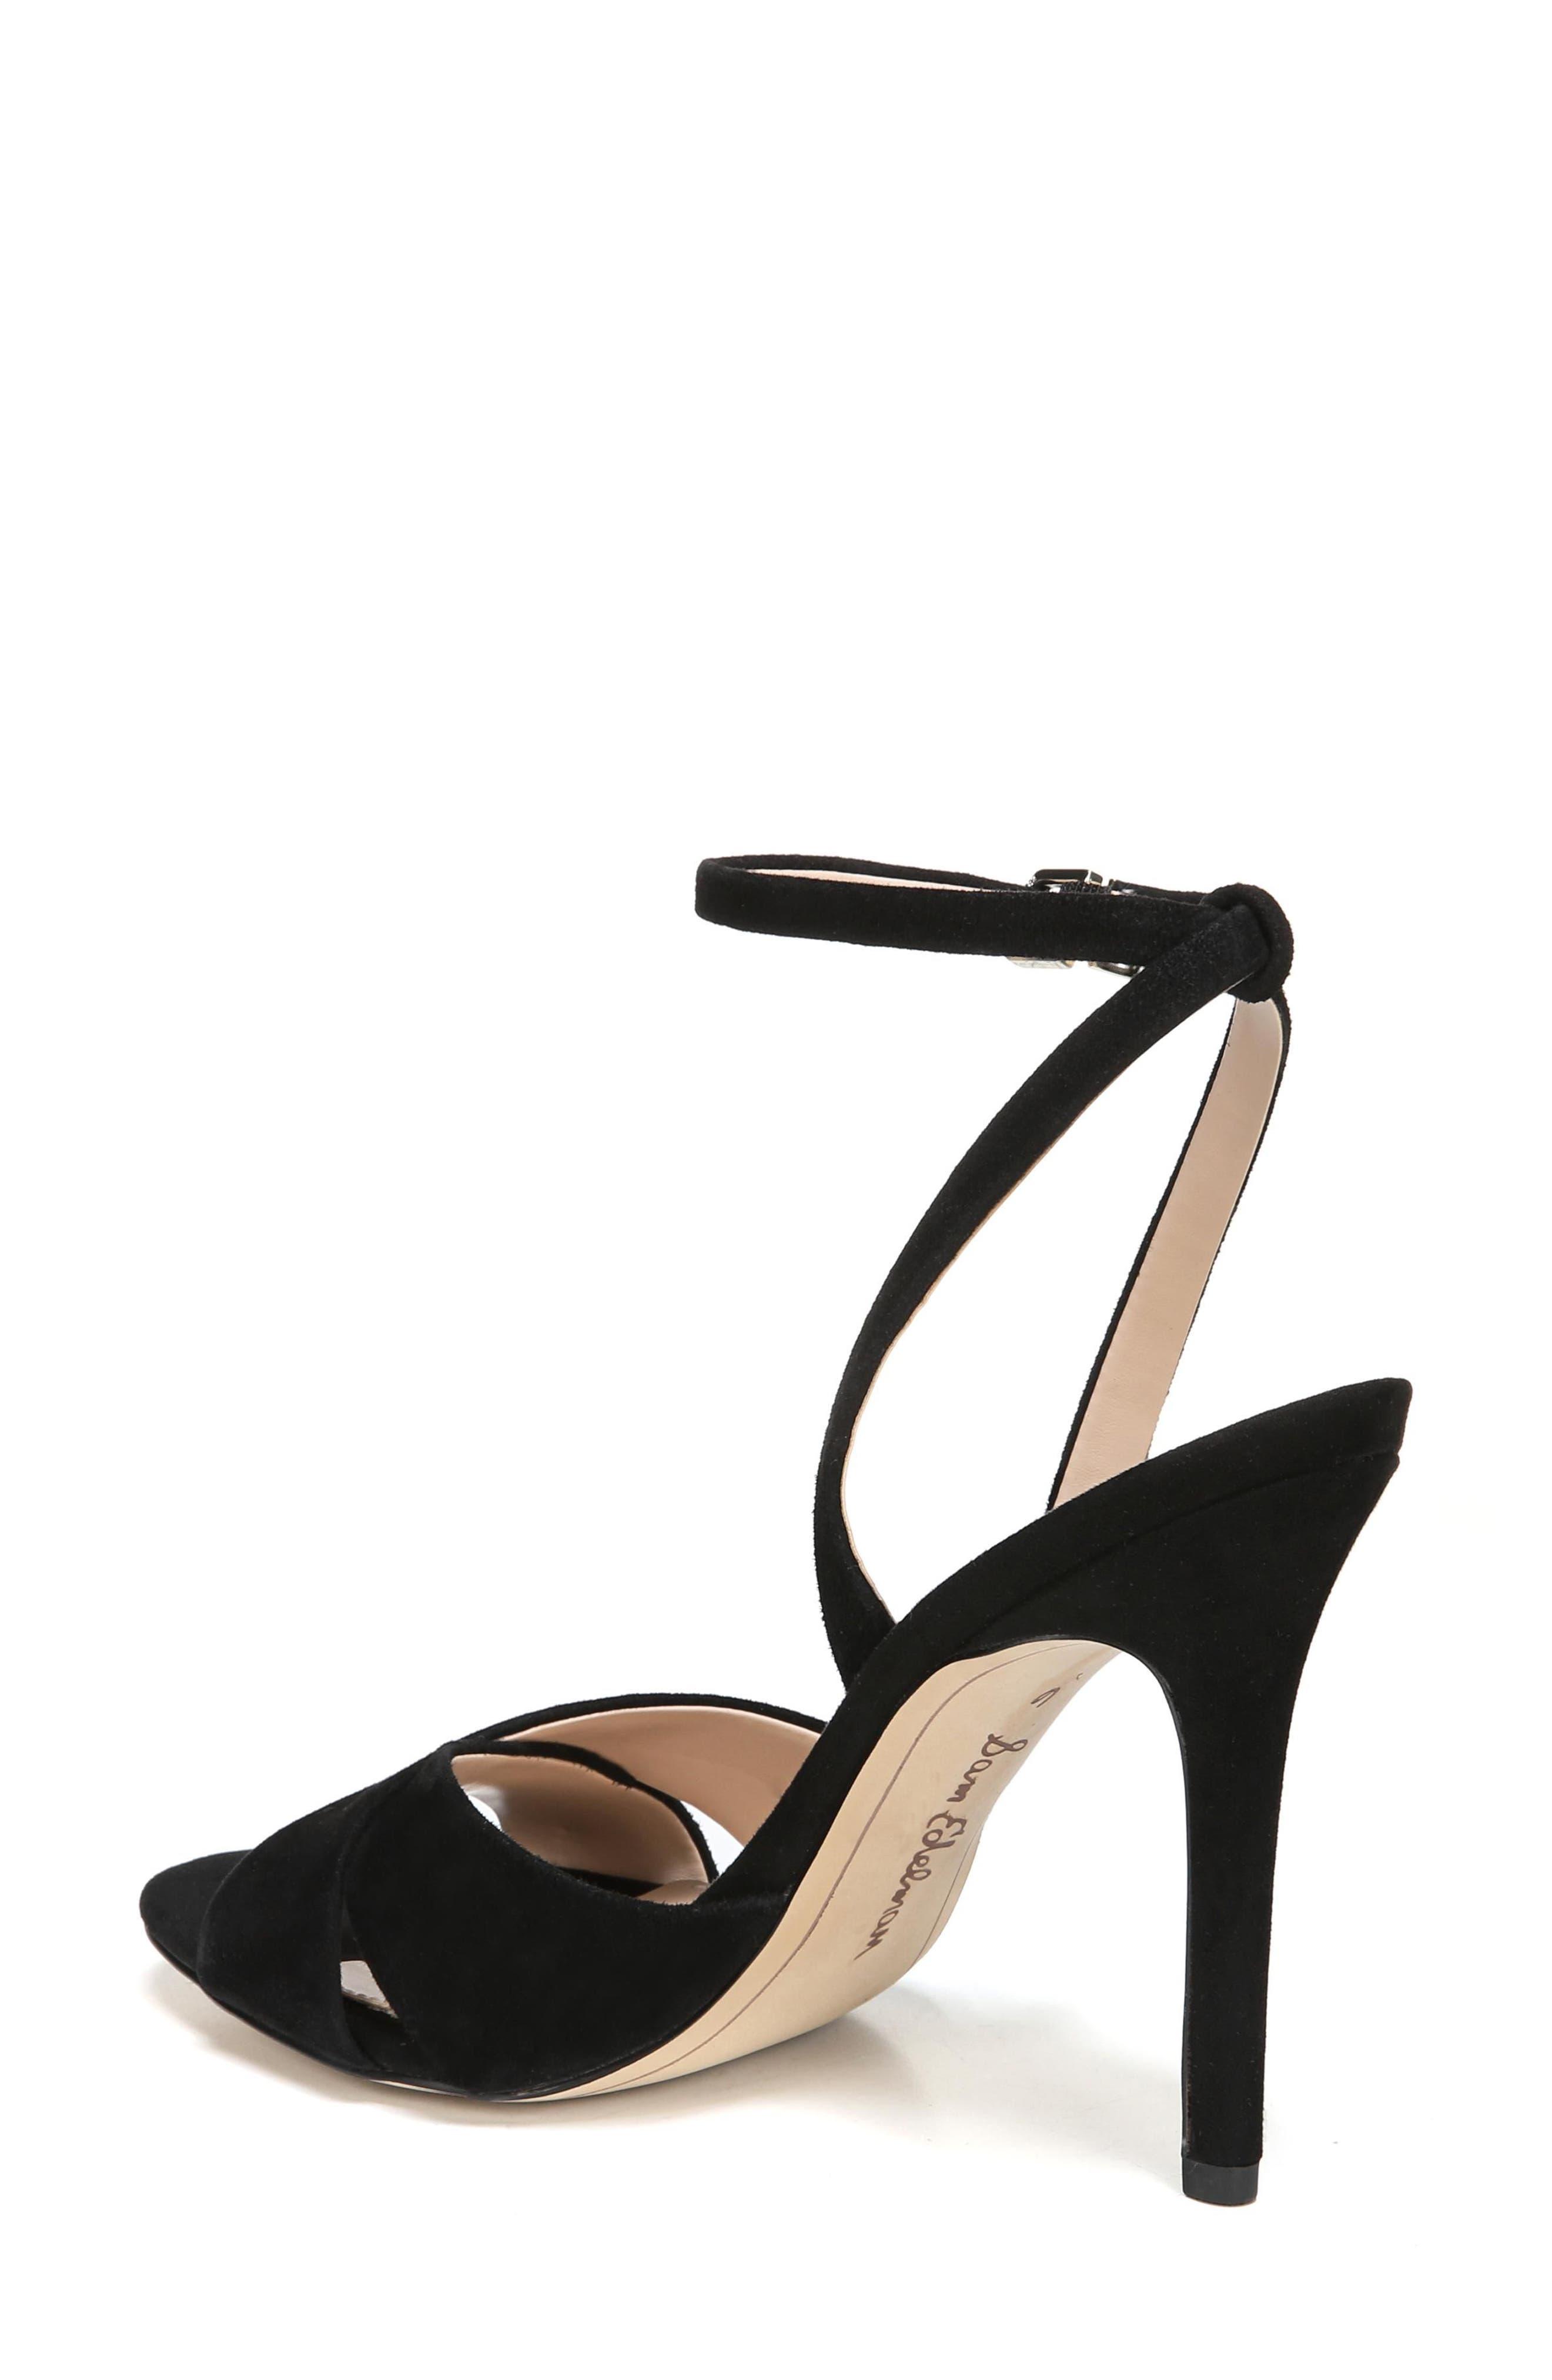 Aly Ankle Strap Sandal,                             Alternate thumbnail 2, color,                             Black Suede